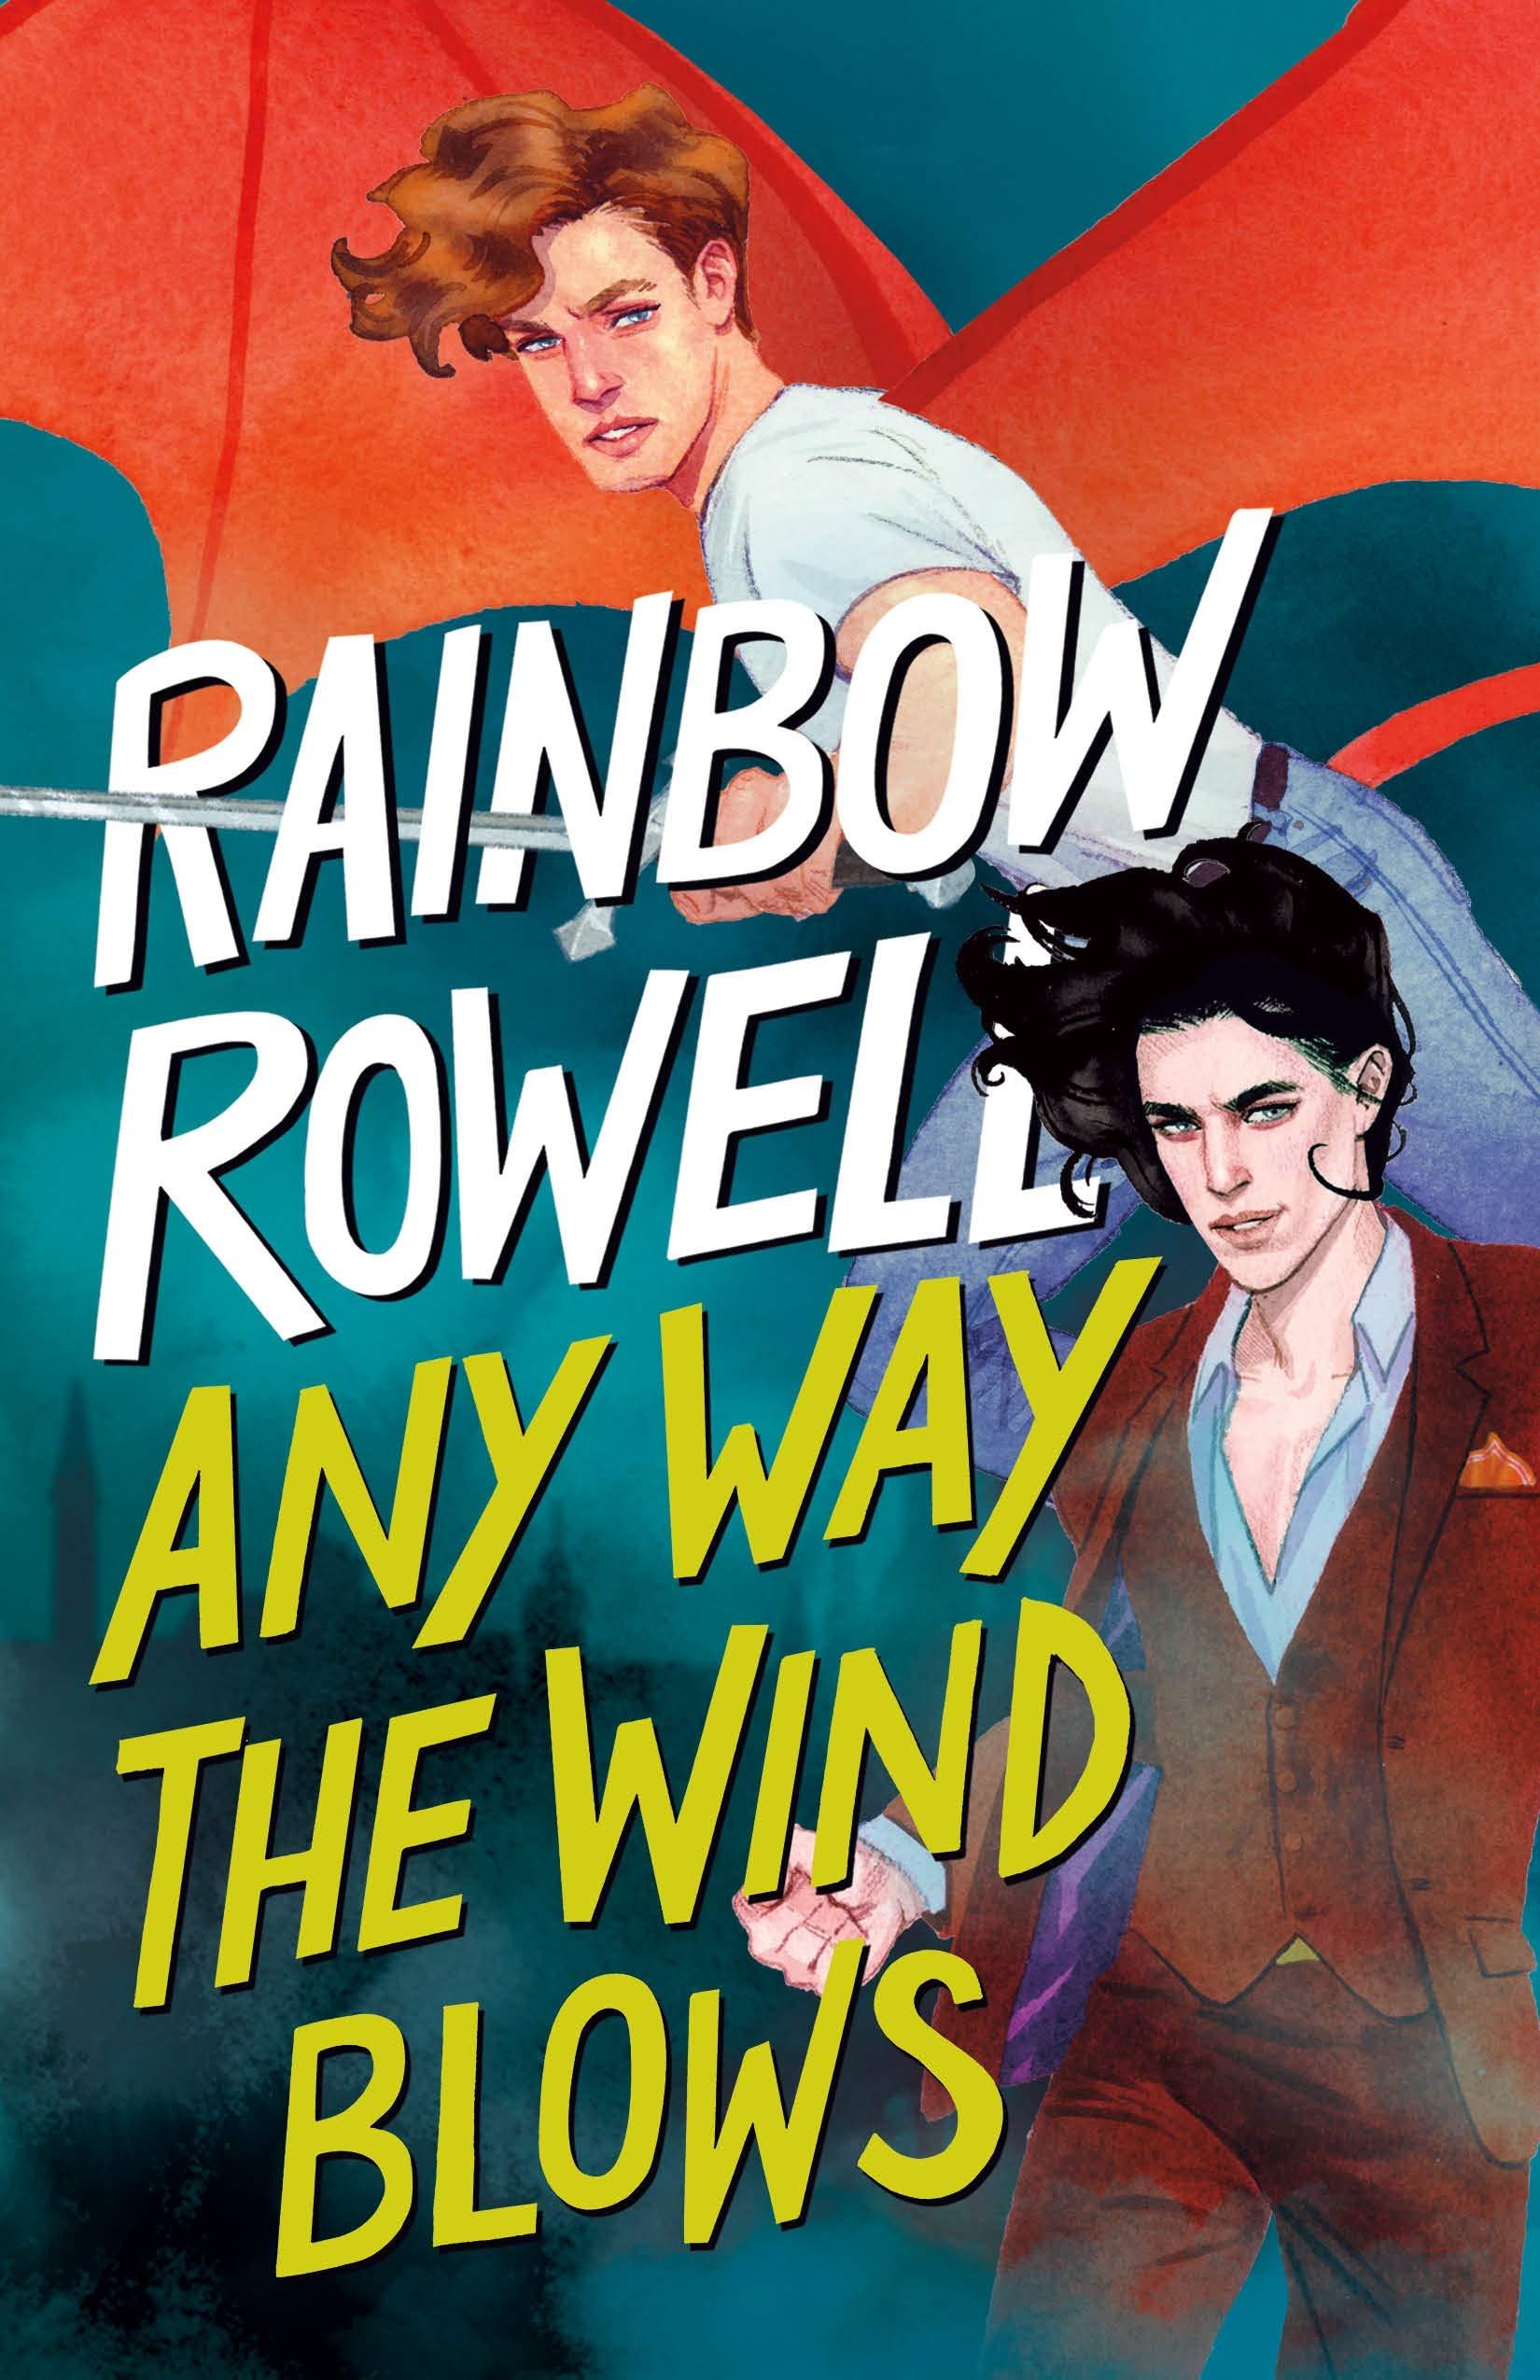 Amazon.com: Any Way the Wind Blows (Simon Snow Trilogy, 3) (9781250254337):  Rowell, Rainbow: Books